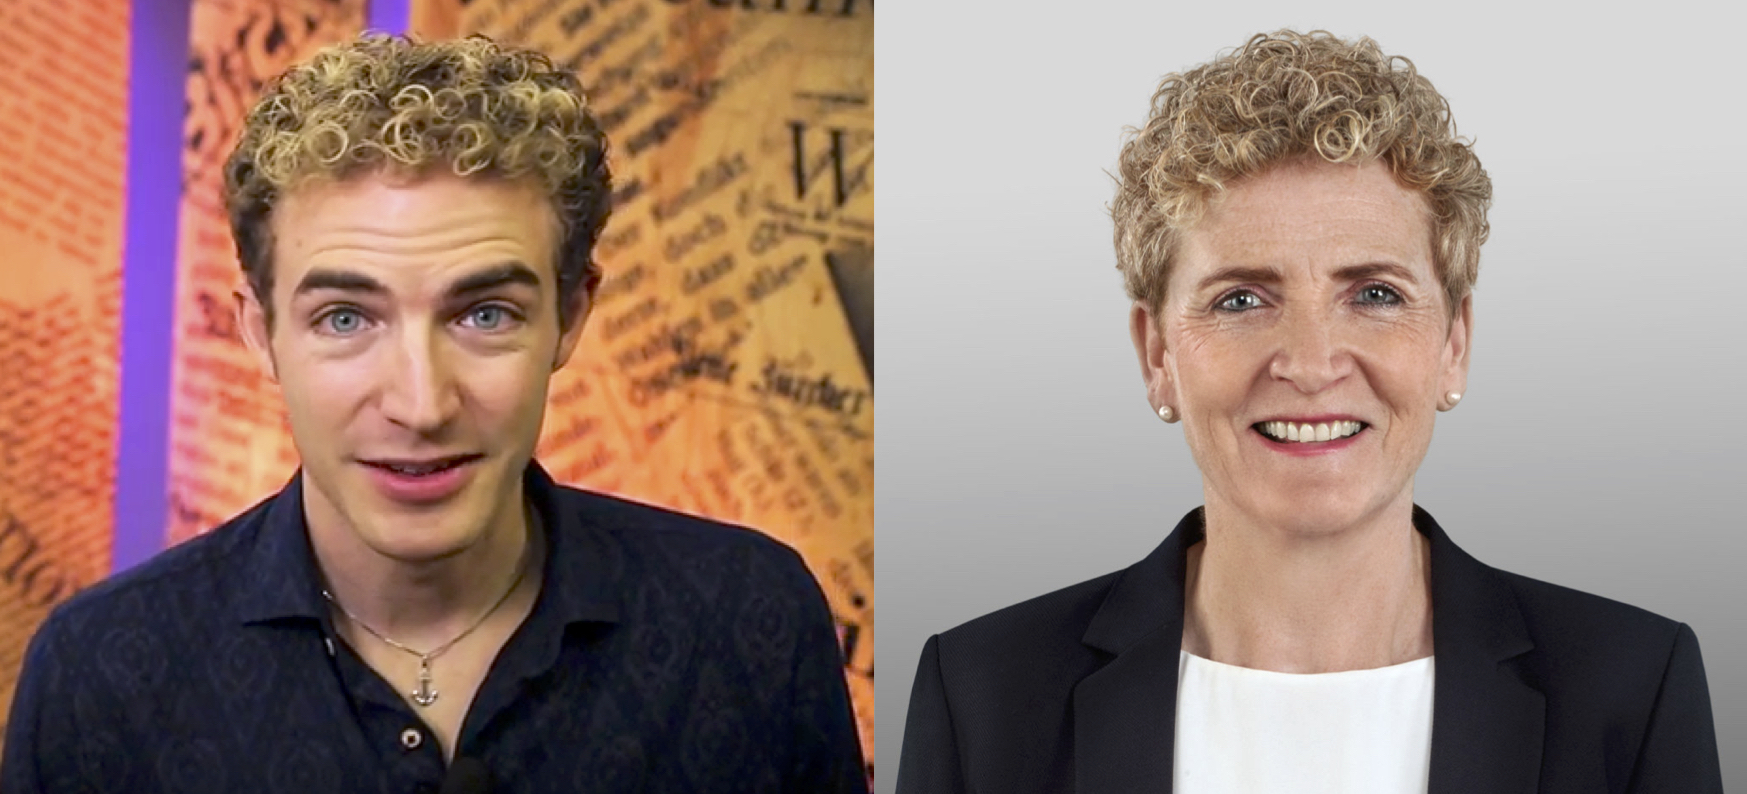 Michael Elsener und Monika Barmet, haben laut Elsener vermutlich den selben Coiffeur.